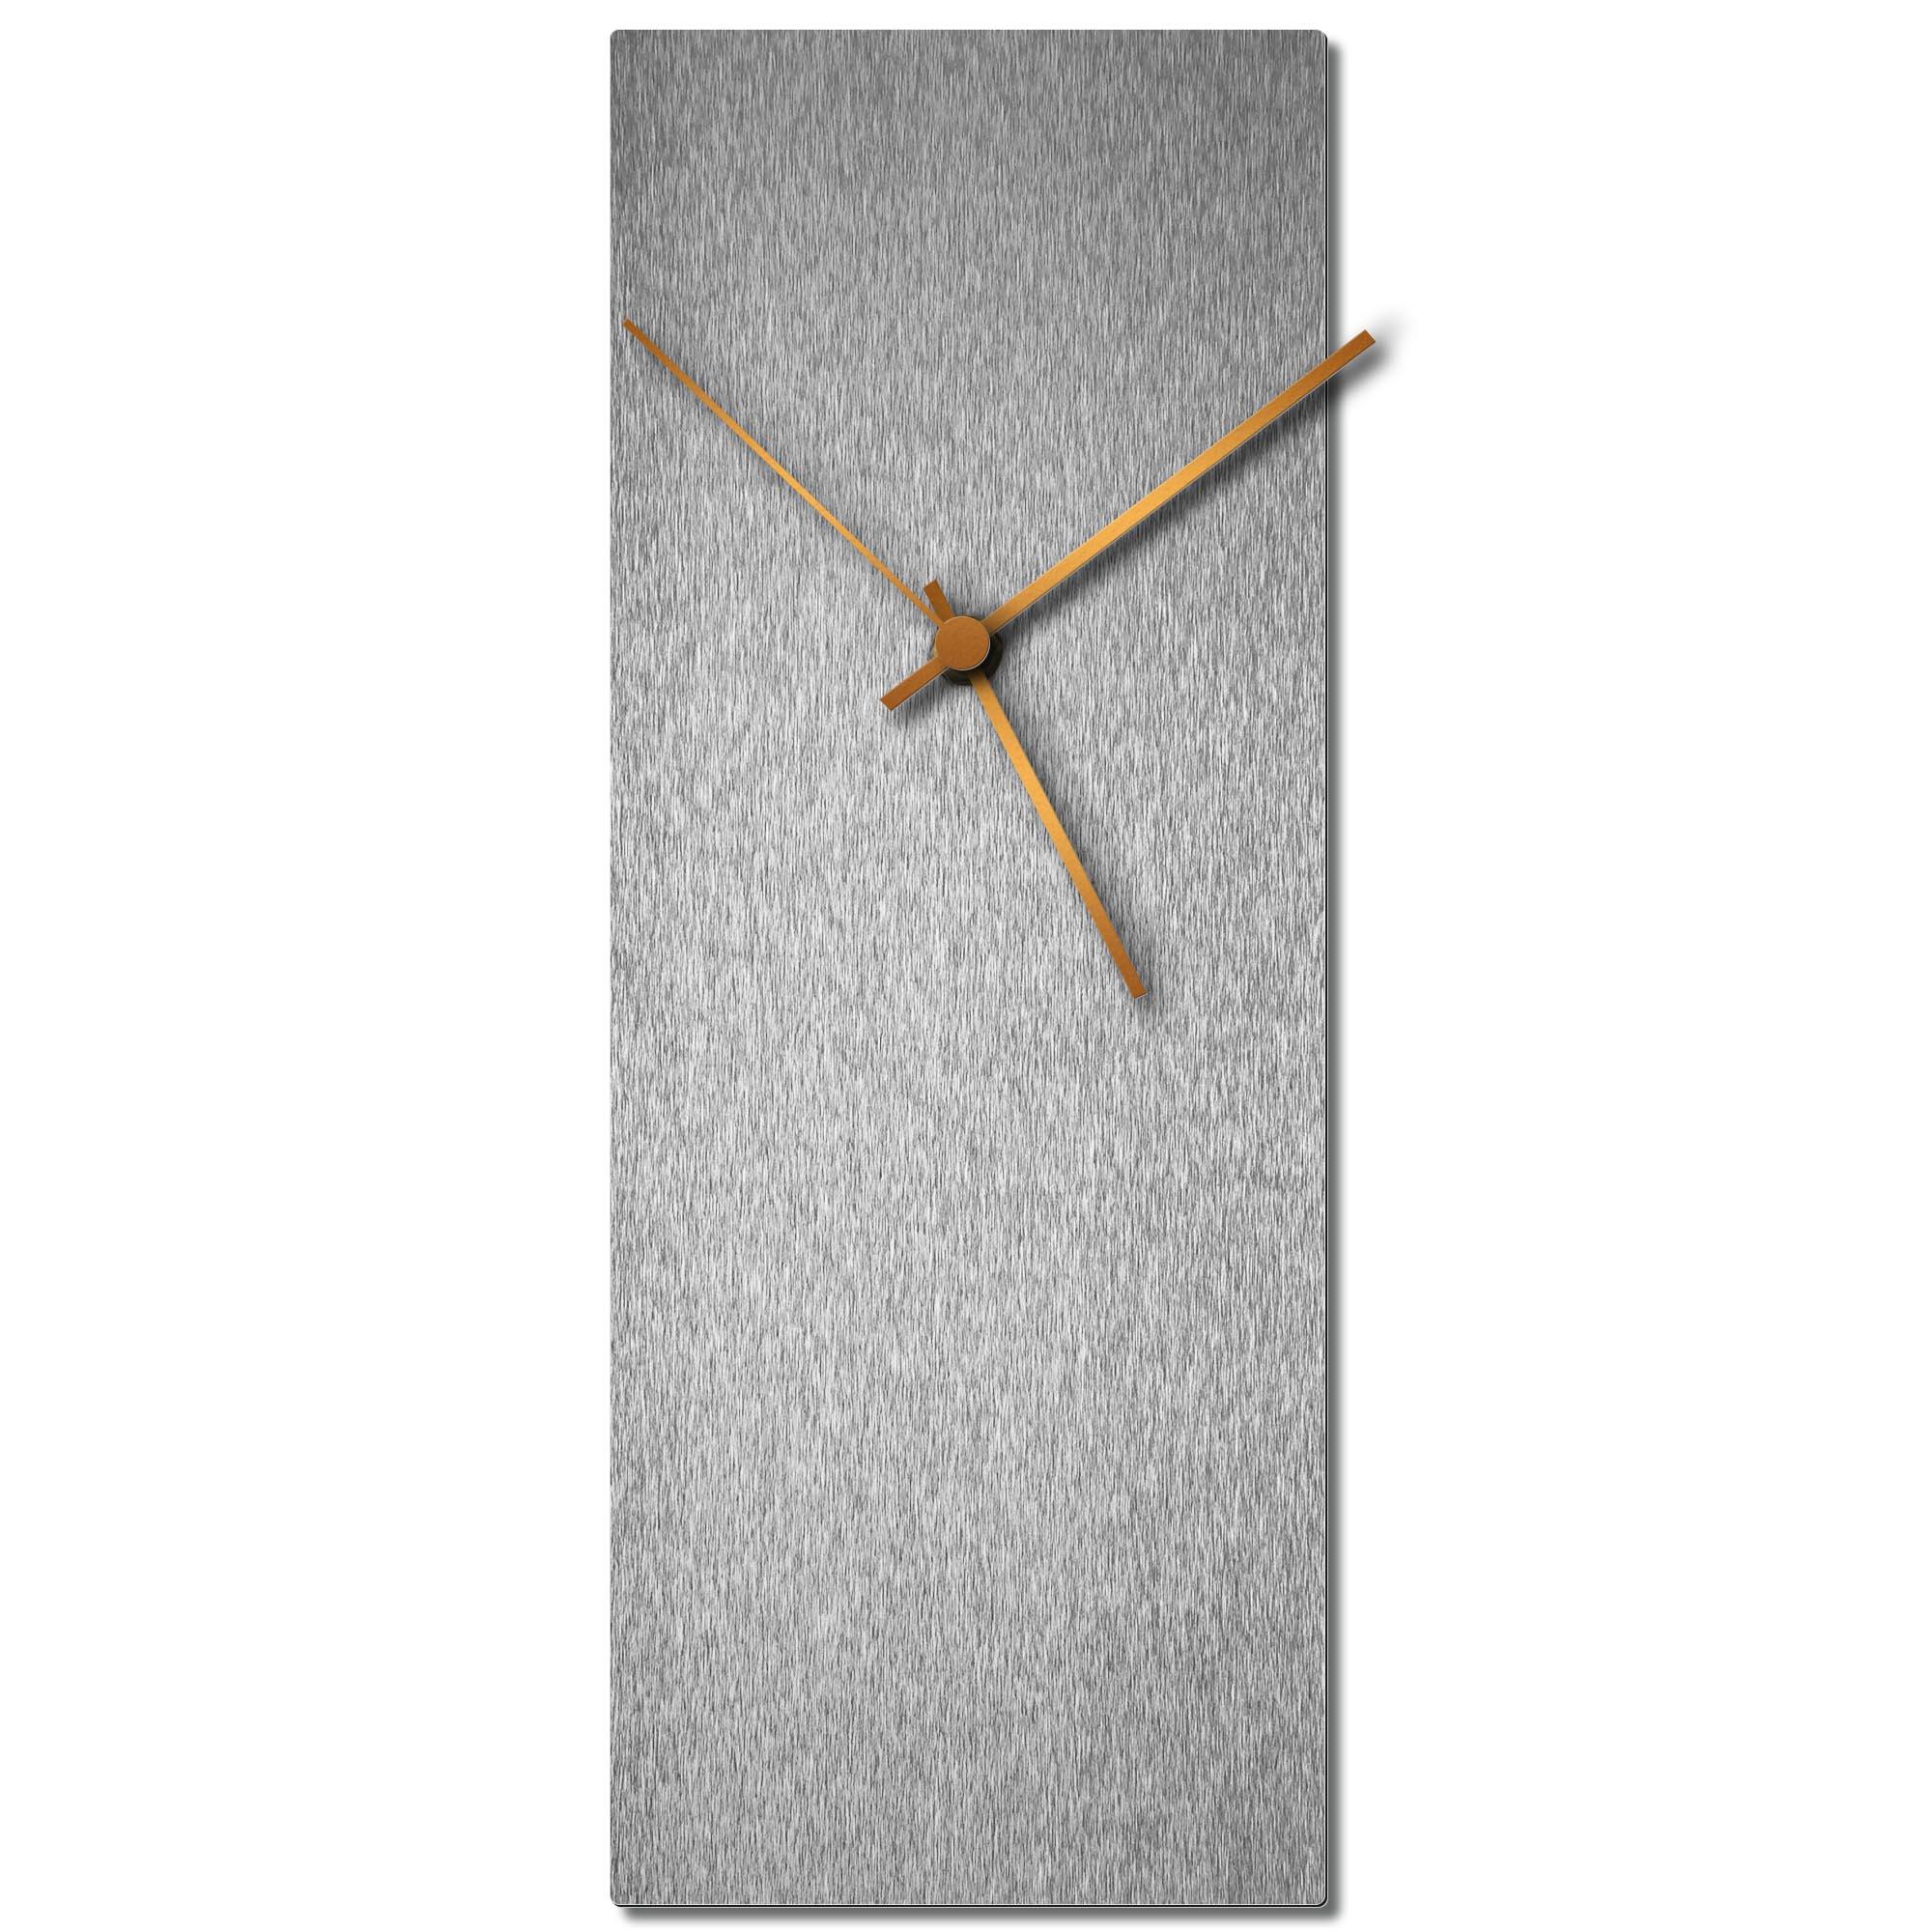 Adam Schwoeppe 'Silversmith Clock Large Bronze' Midcentury Modern Style Wall Clock